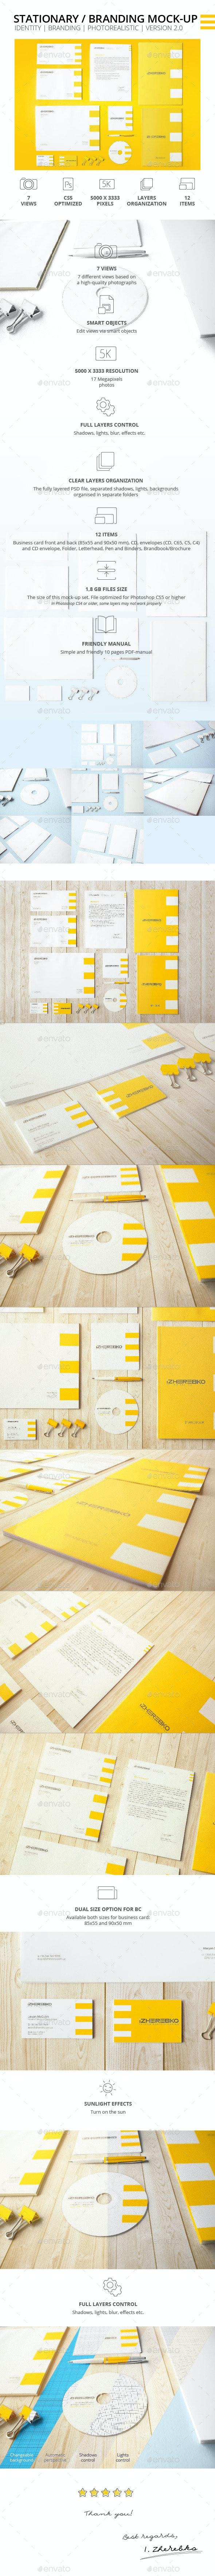 Stationary / Branding Photorealistic Mock-up - Stationery Print